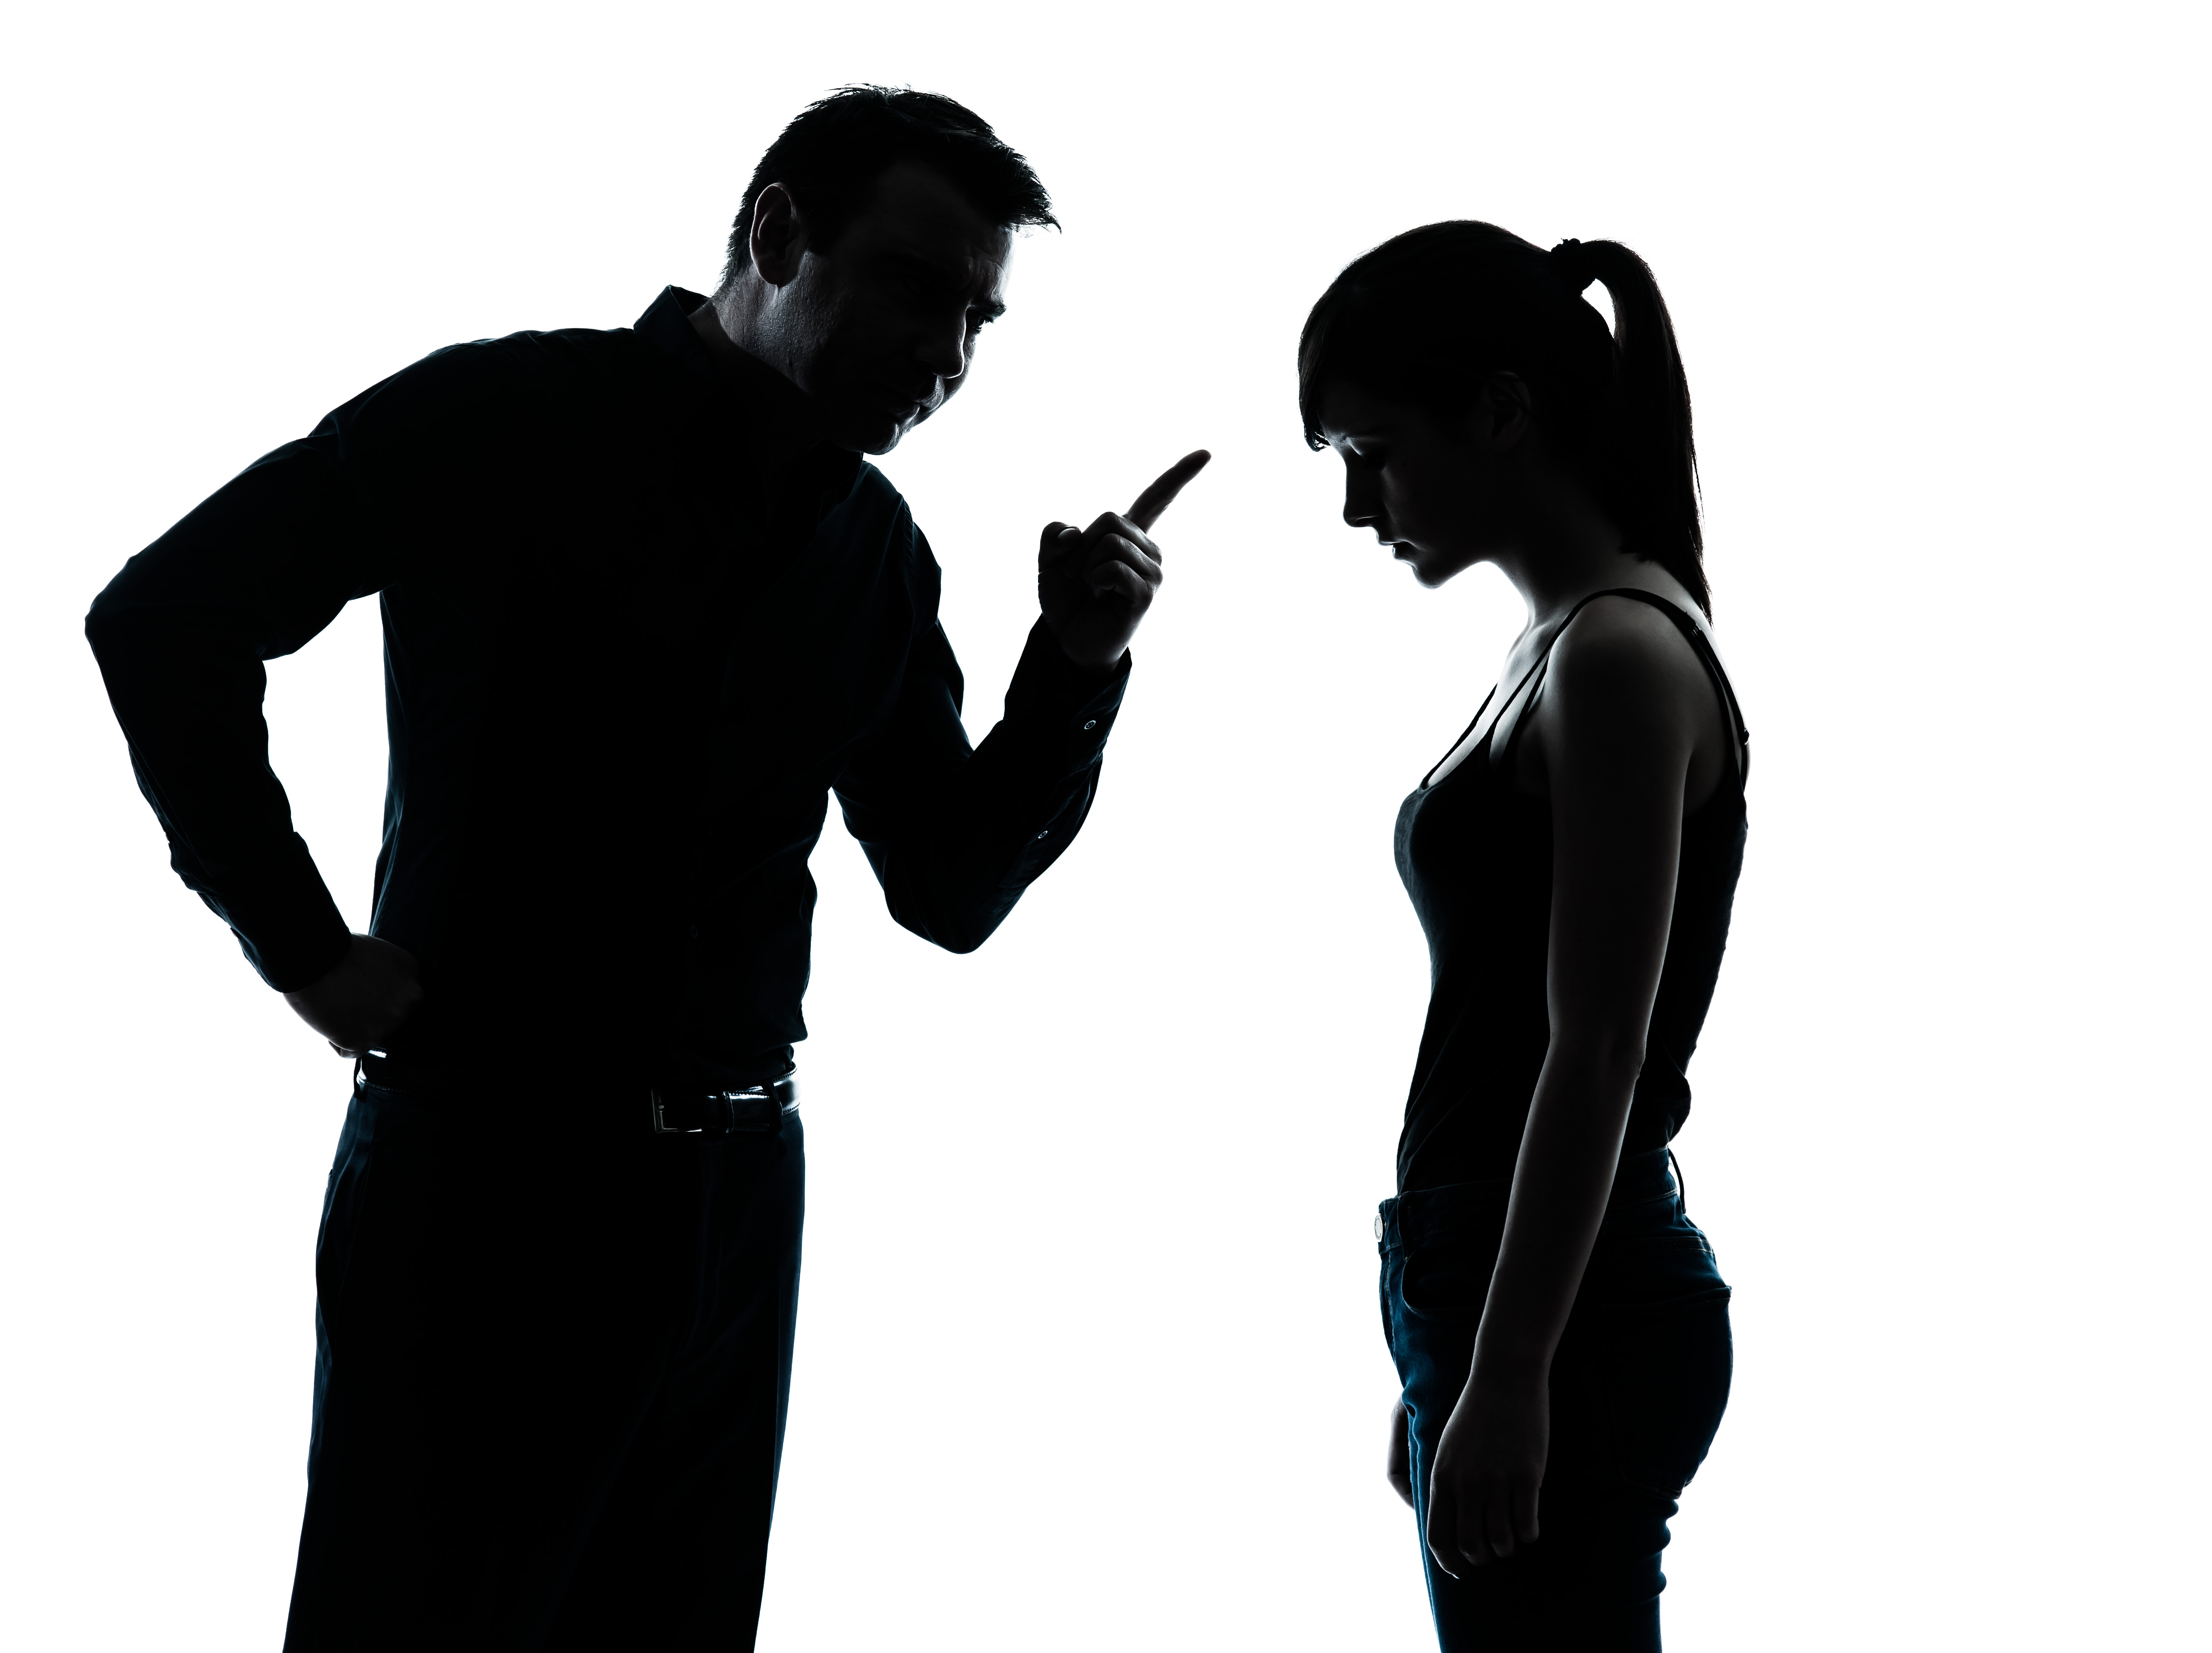 Emotional Manipulation Part 3 — How to Identify Manipulative